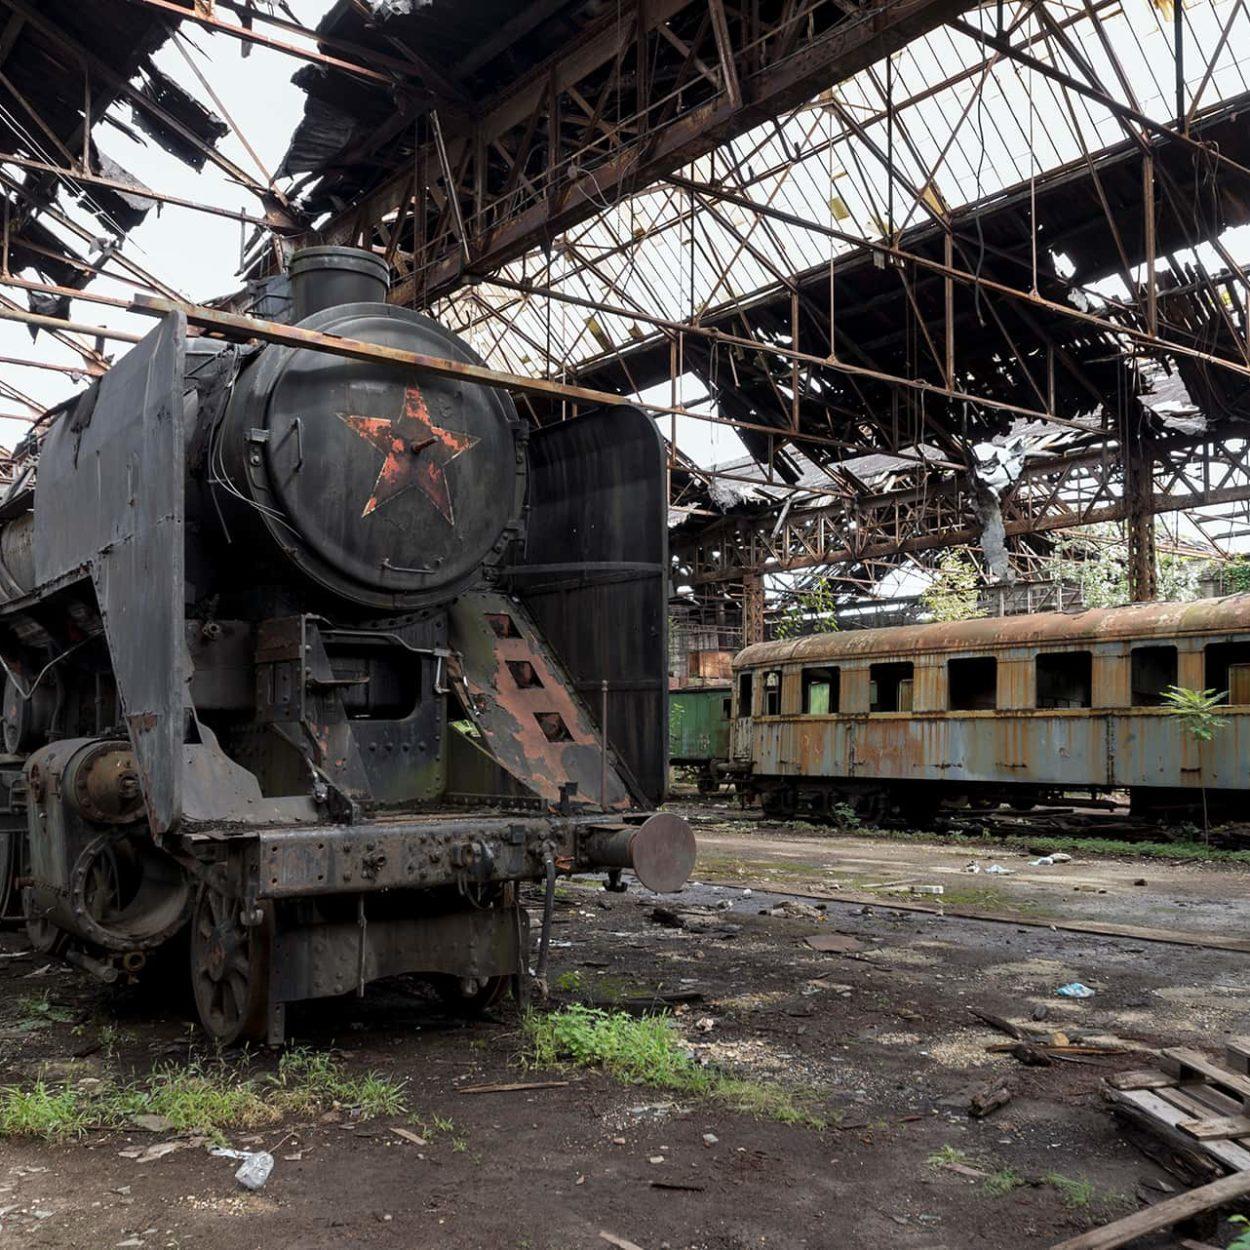 urbex-urban-exploration-hongrie-train-Istvantelek-red-star